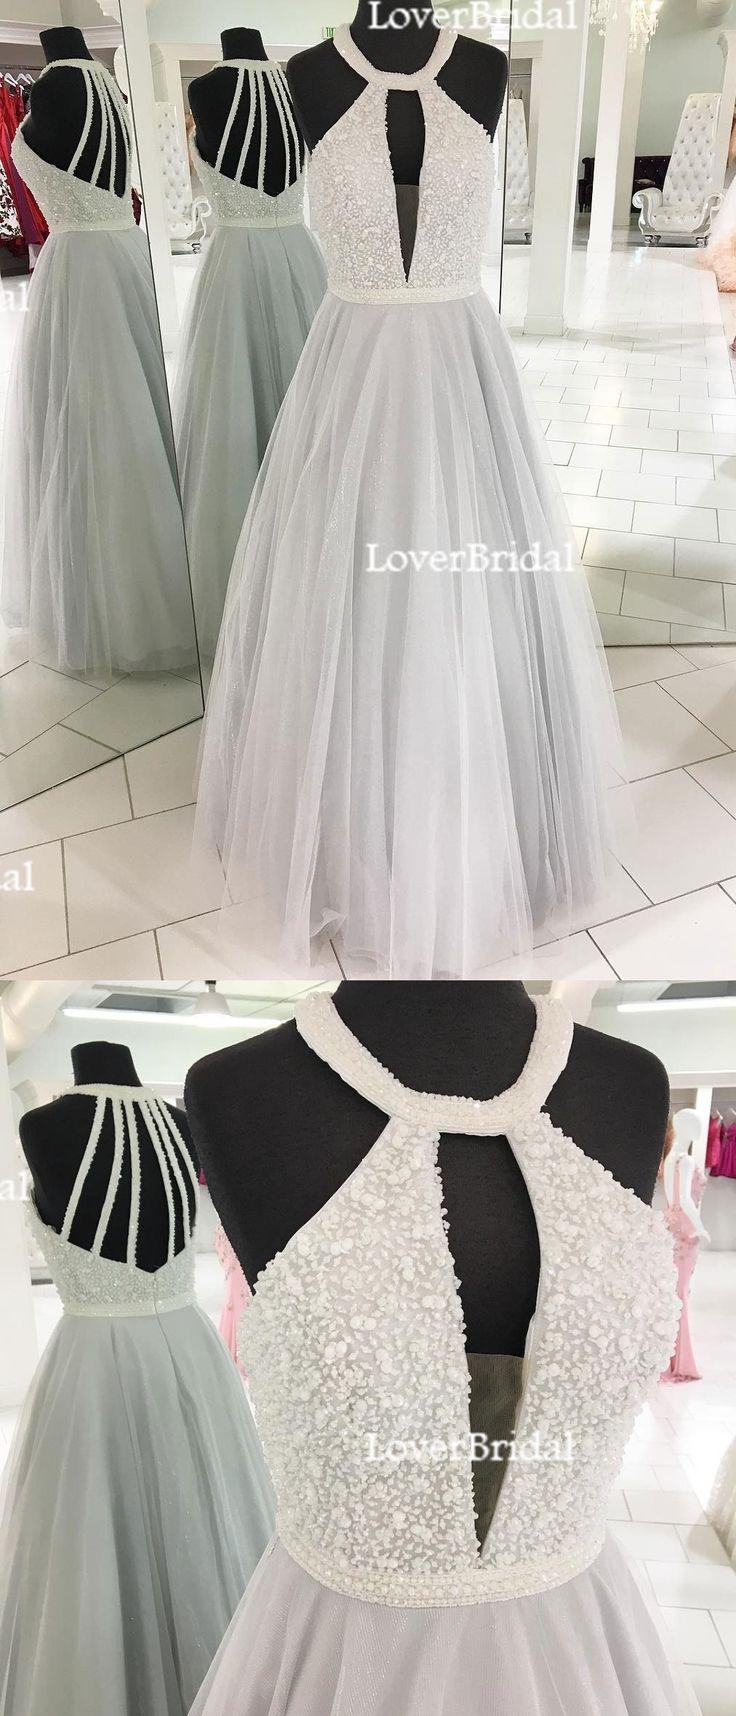 2018 Cheap Elegant Fashion Sexy Halter Tulle Beaded A line Custom Grey Long Evening Prom Dresses, 17359